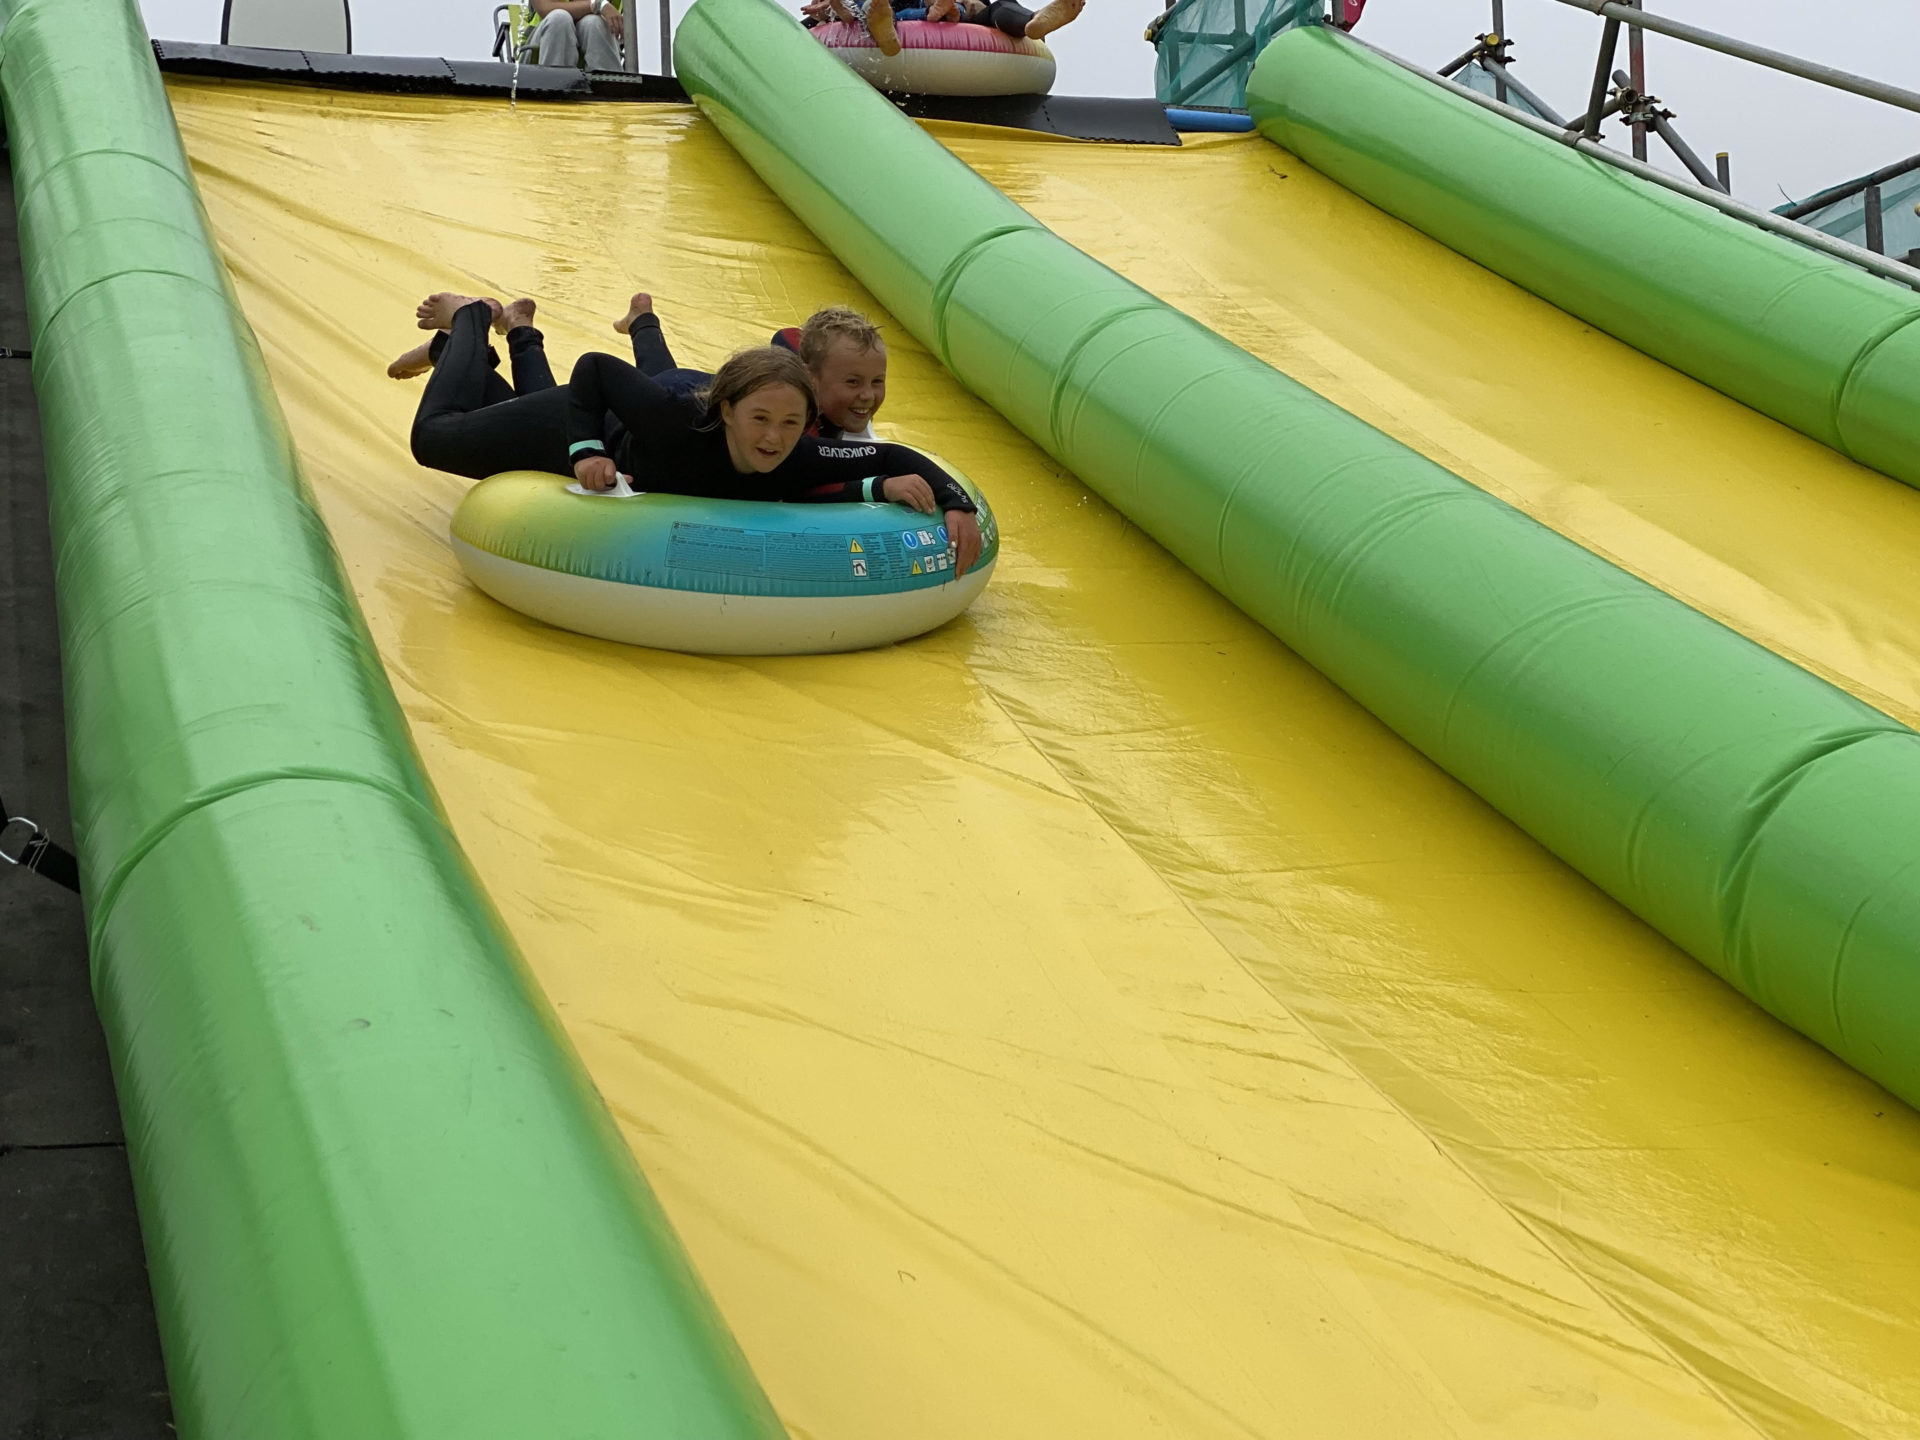 The Great Cornish Slip and Slide